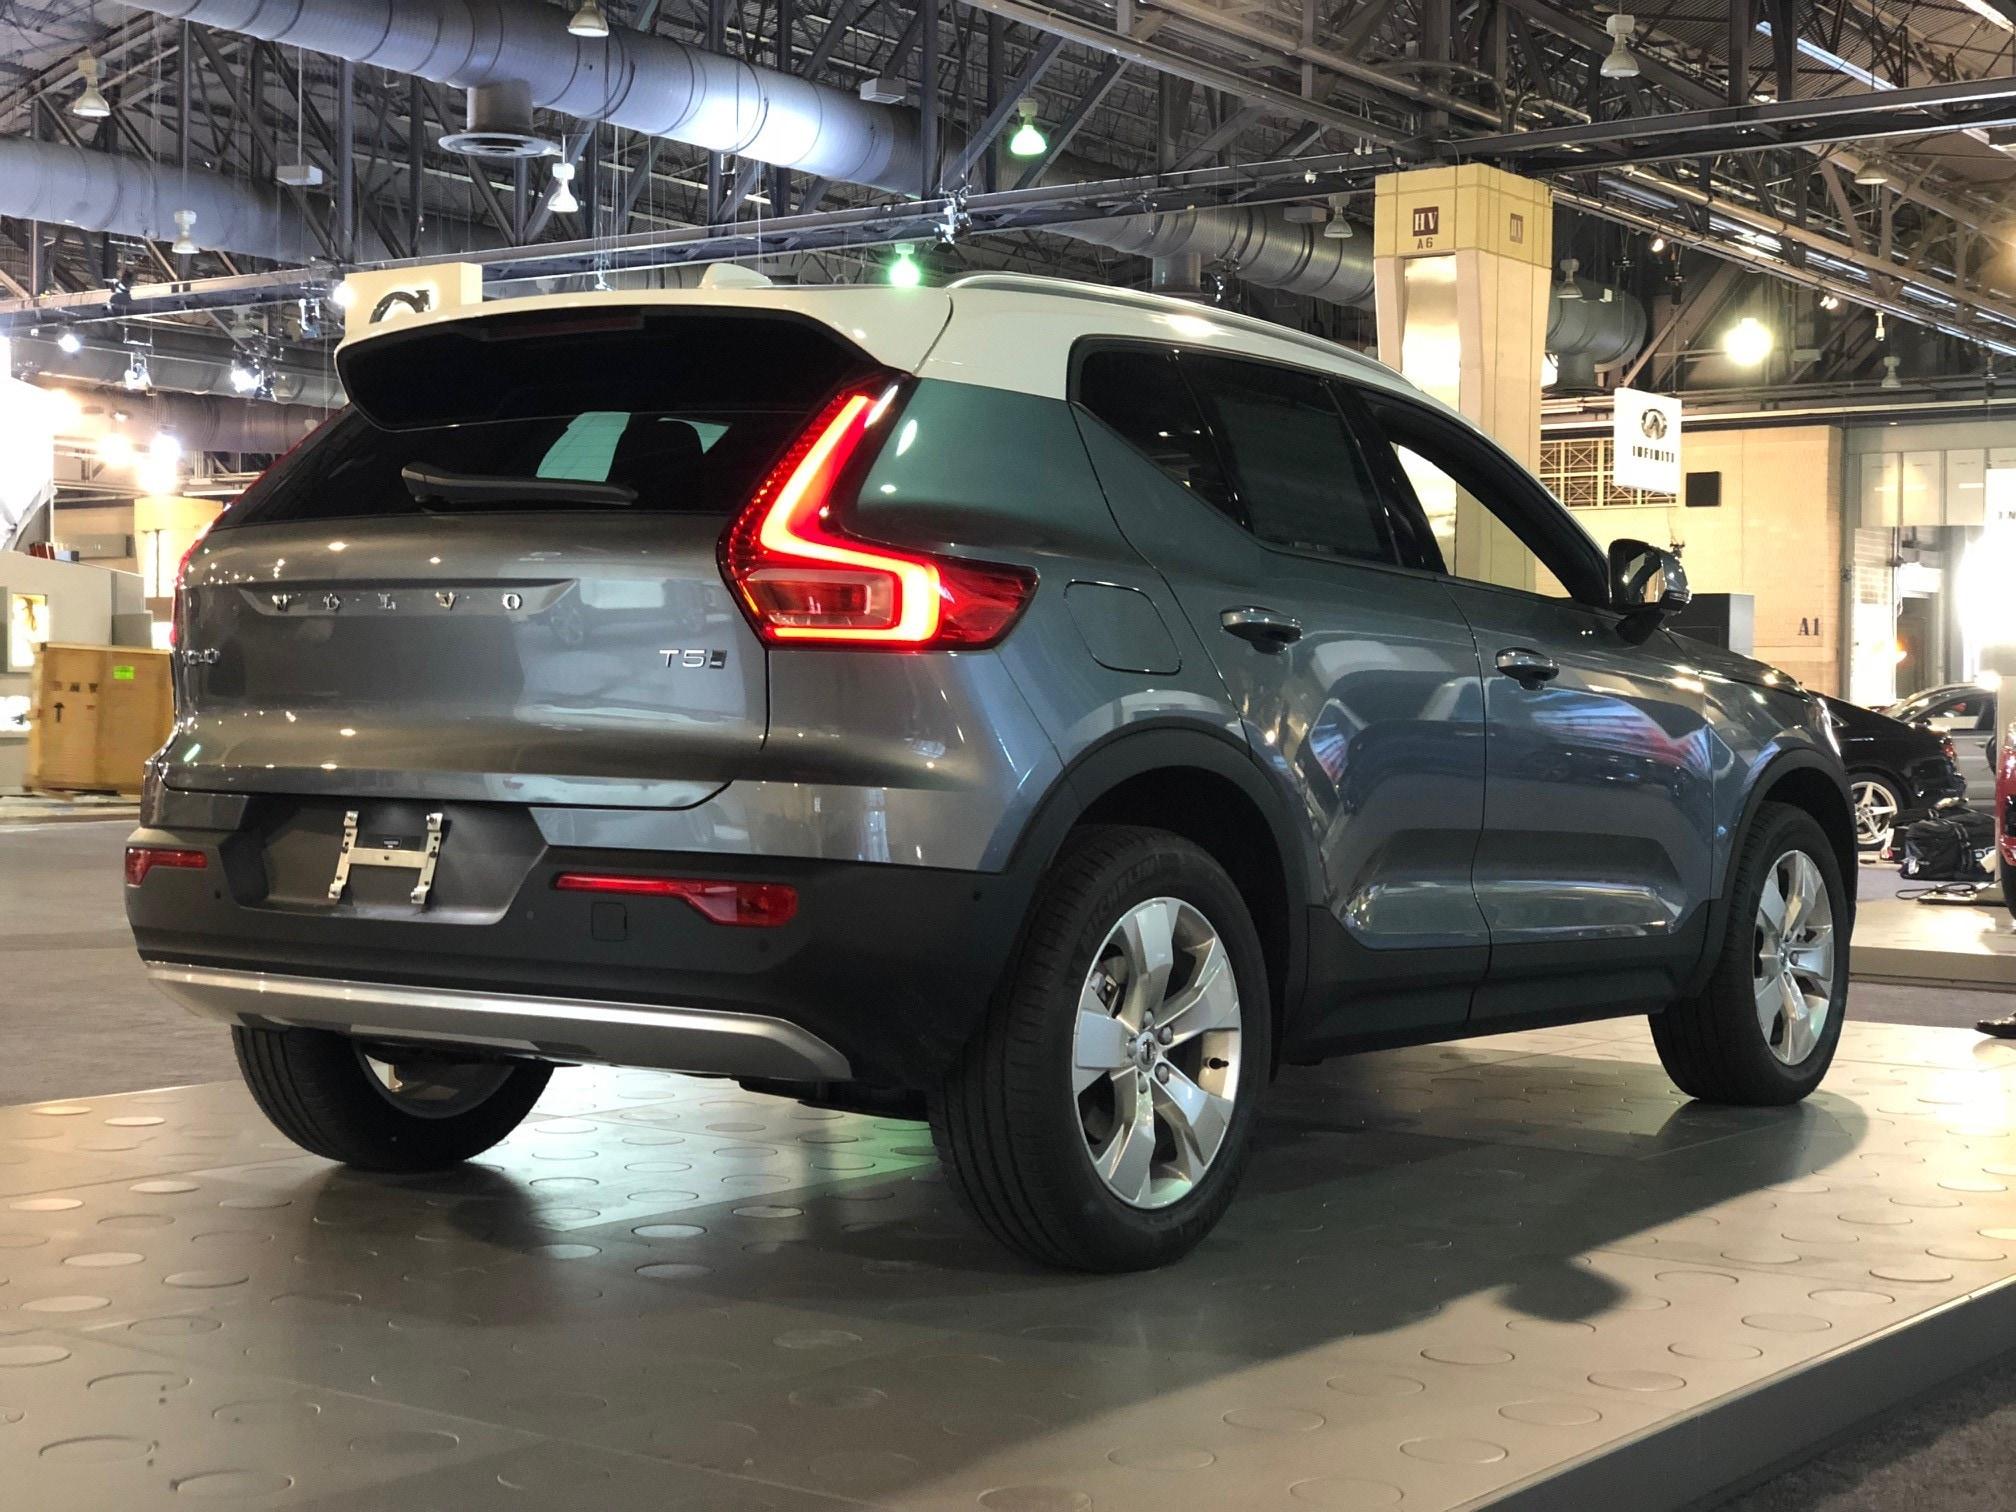 Cherry Hill Volvo Cars | New Volvo dealership in Cherry Hill, NJ 08002